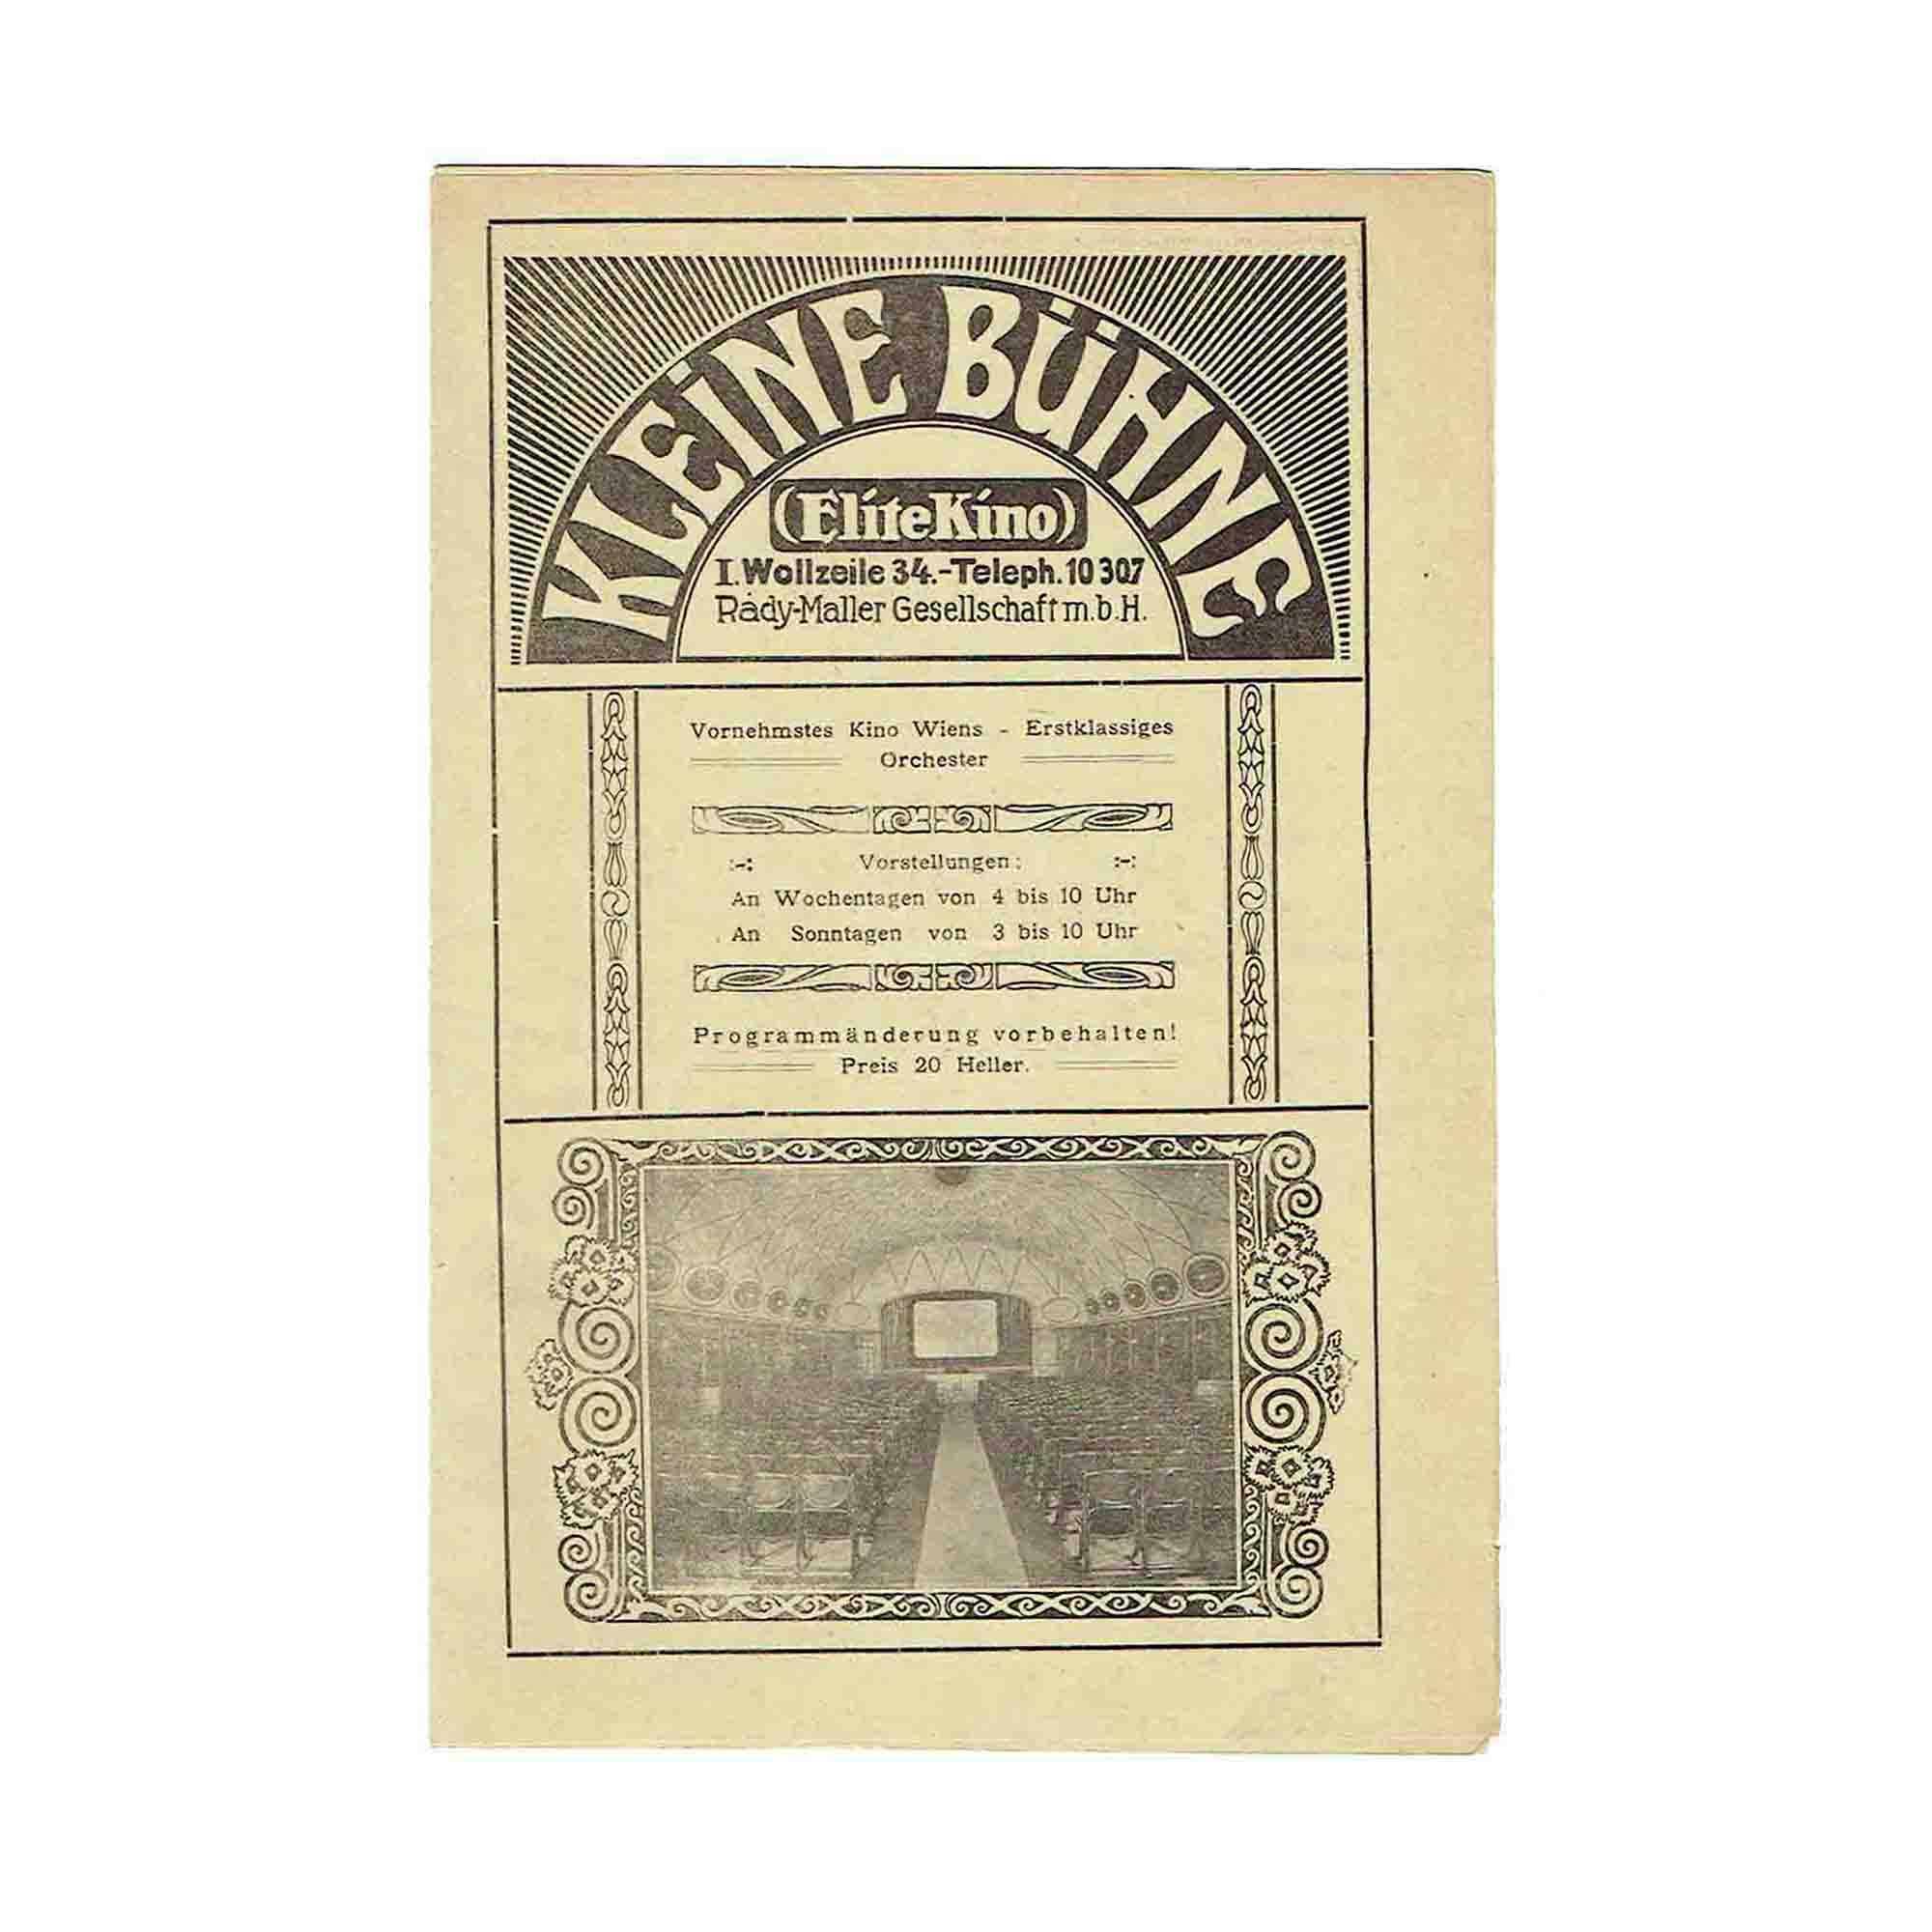 5429-Elitek-Kino-Programm-Karte-1918-Umschlag-N.jpg